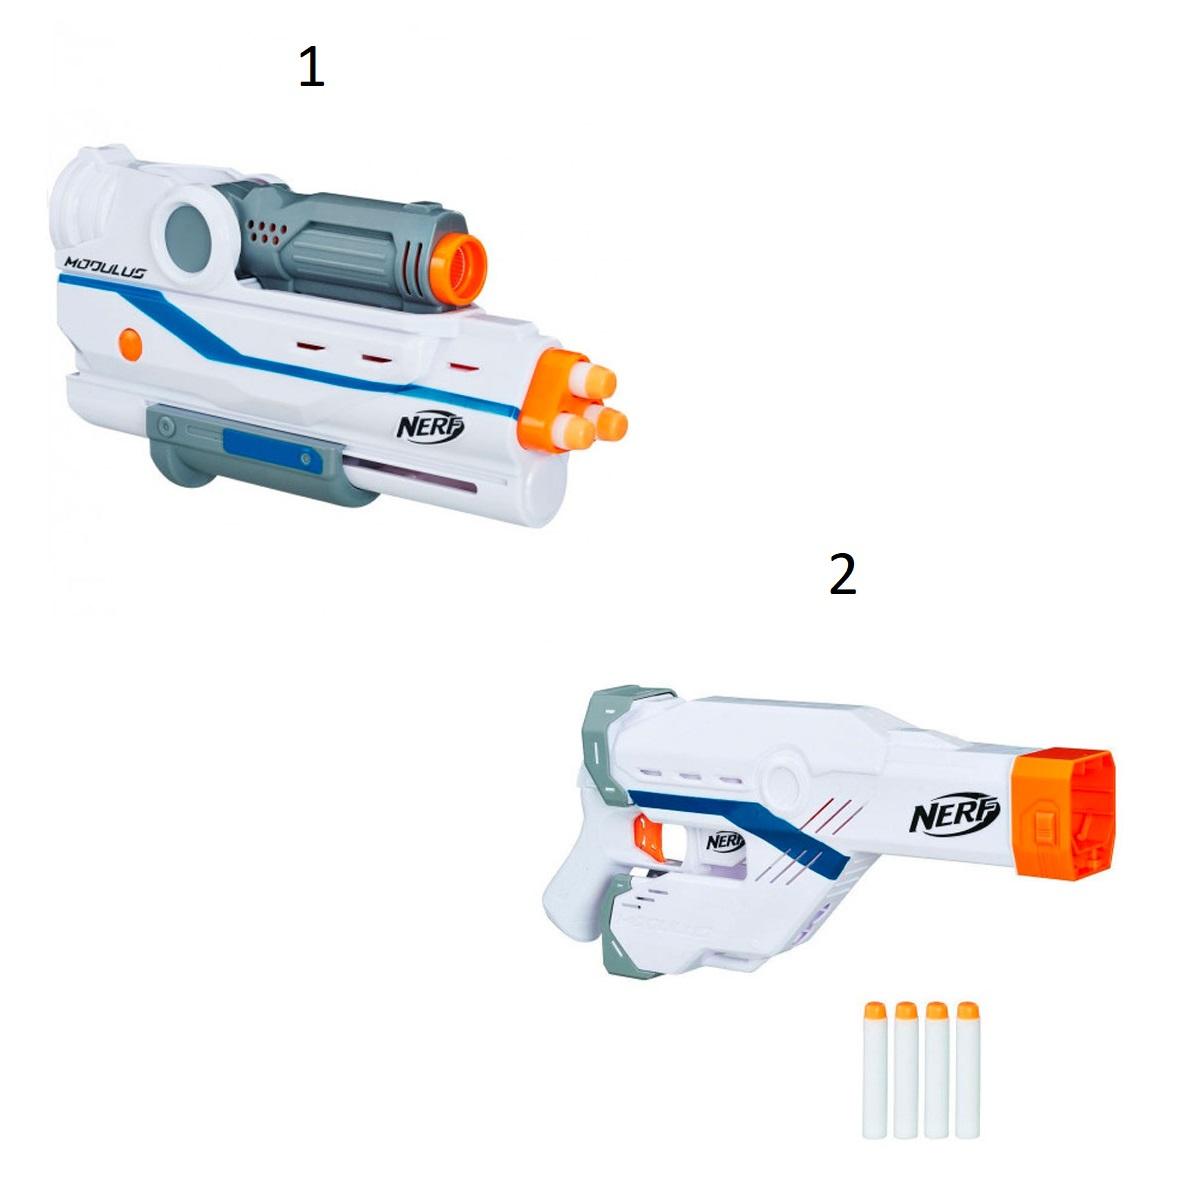 Купить Бластеры-аксессуары для стрельбы Нёрф Модулус, 2 вида, Hasbro